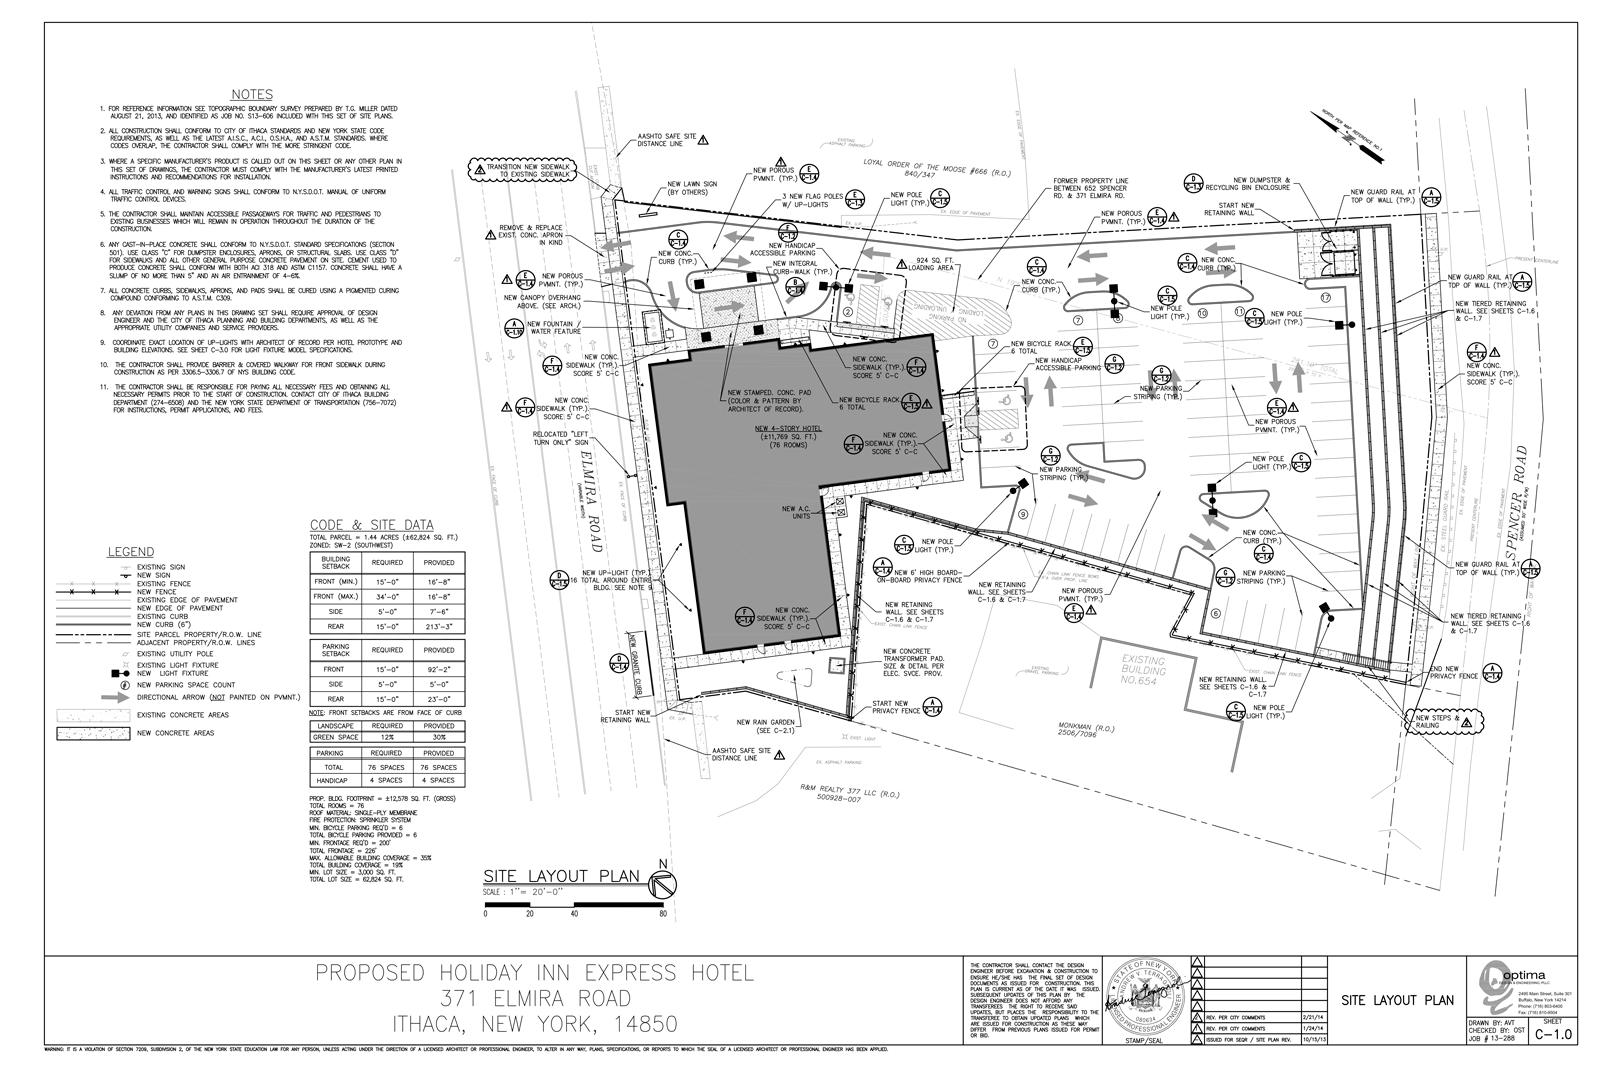 Elmira-Road-371---4-Story-Hotel---Revised-Drawings---02-21-14